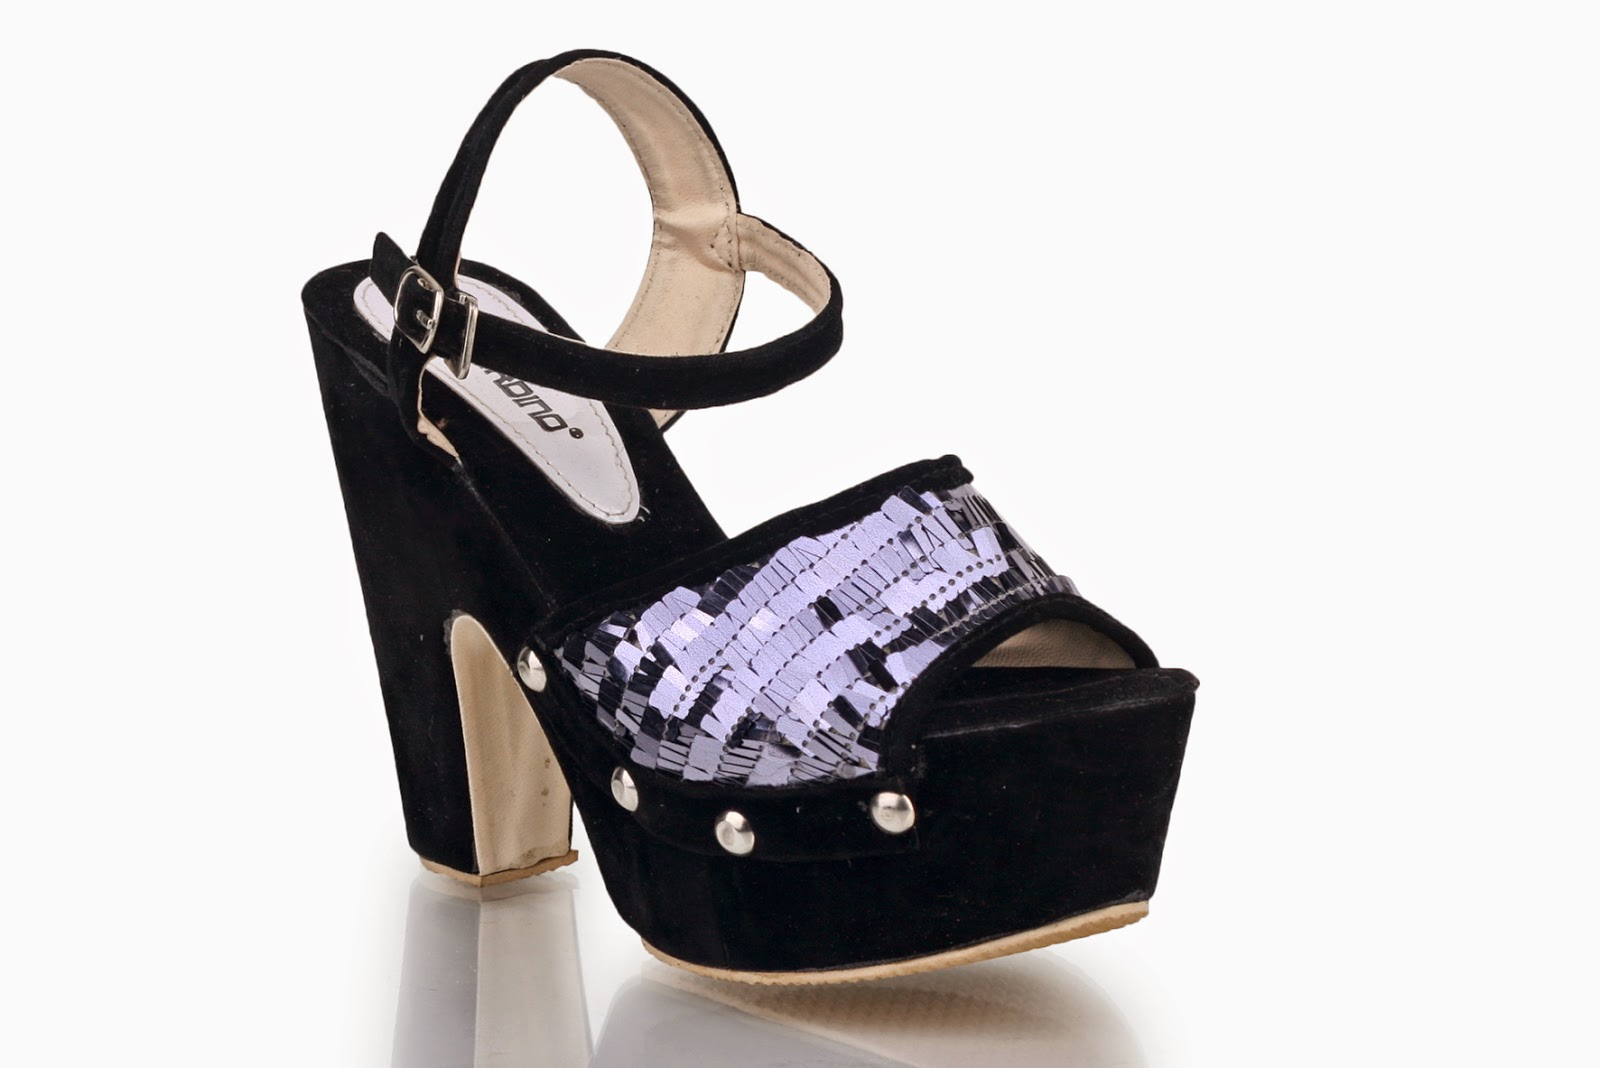 Jual Sandal High Heels Cibaduyut, Grosir Sandal High Heels Cibaduyut, Sandal High Heels Cibaduyut Harga Murah